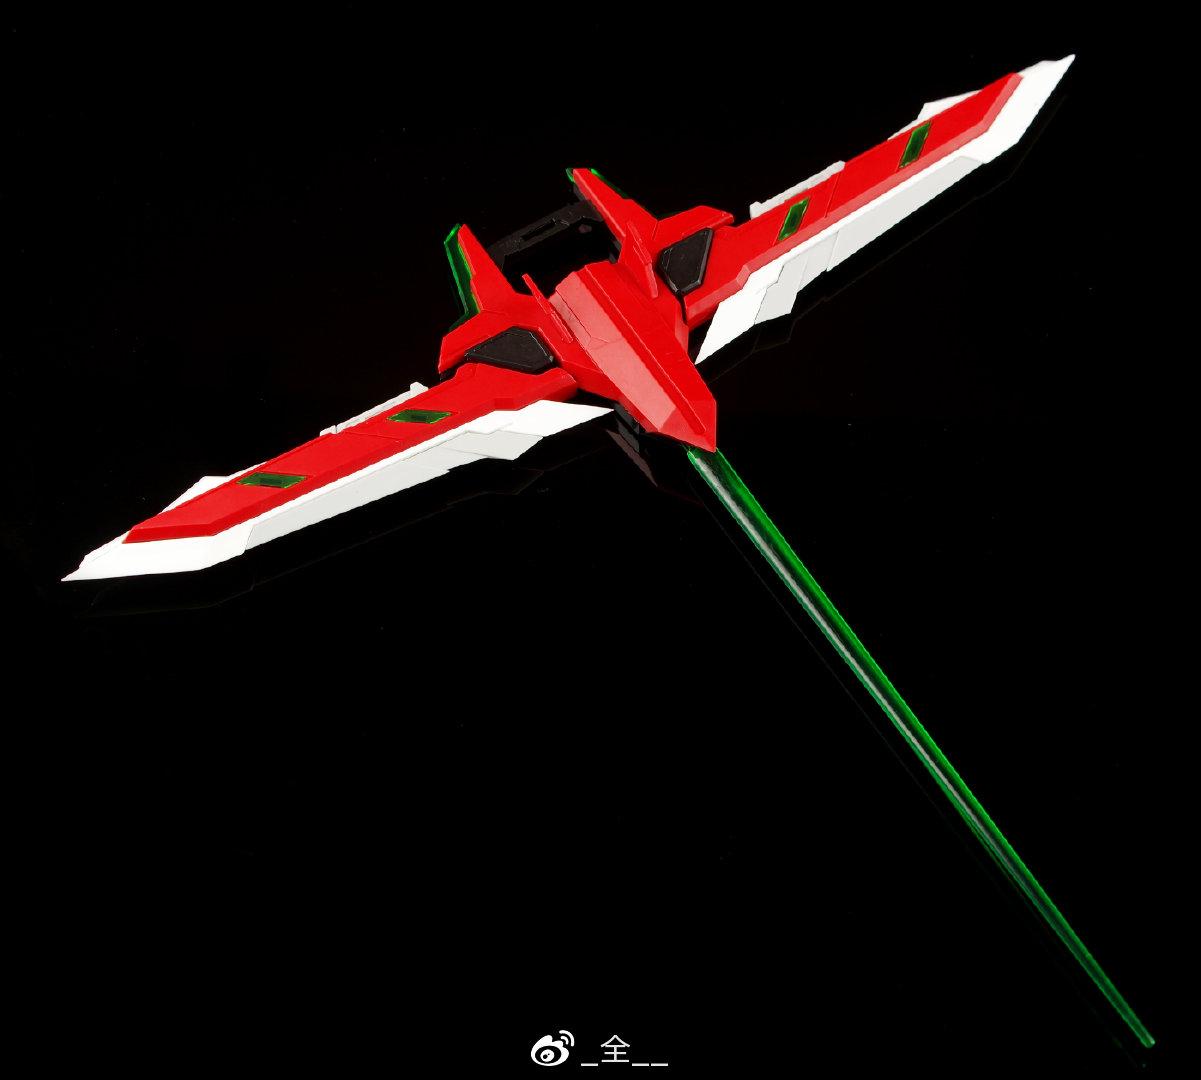 S543_1_astray_mg_dragon_king_sword_066.jpg